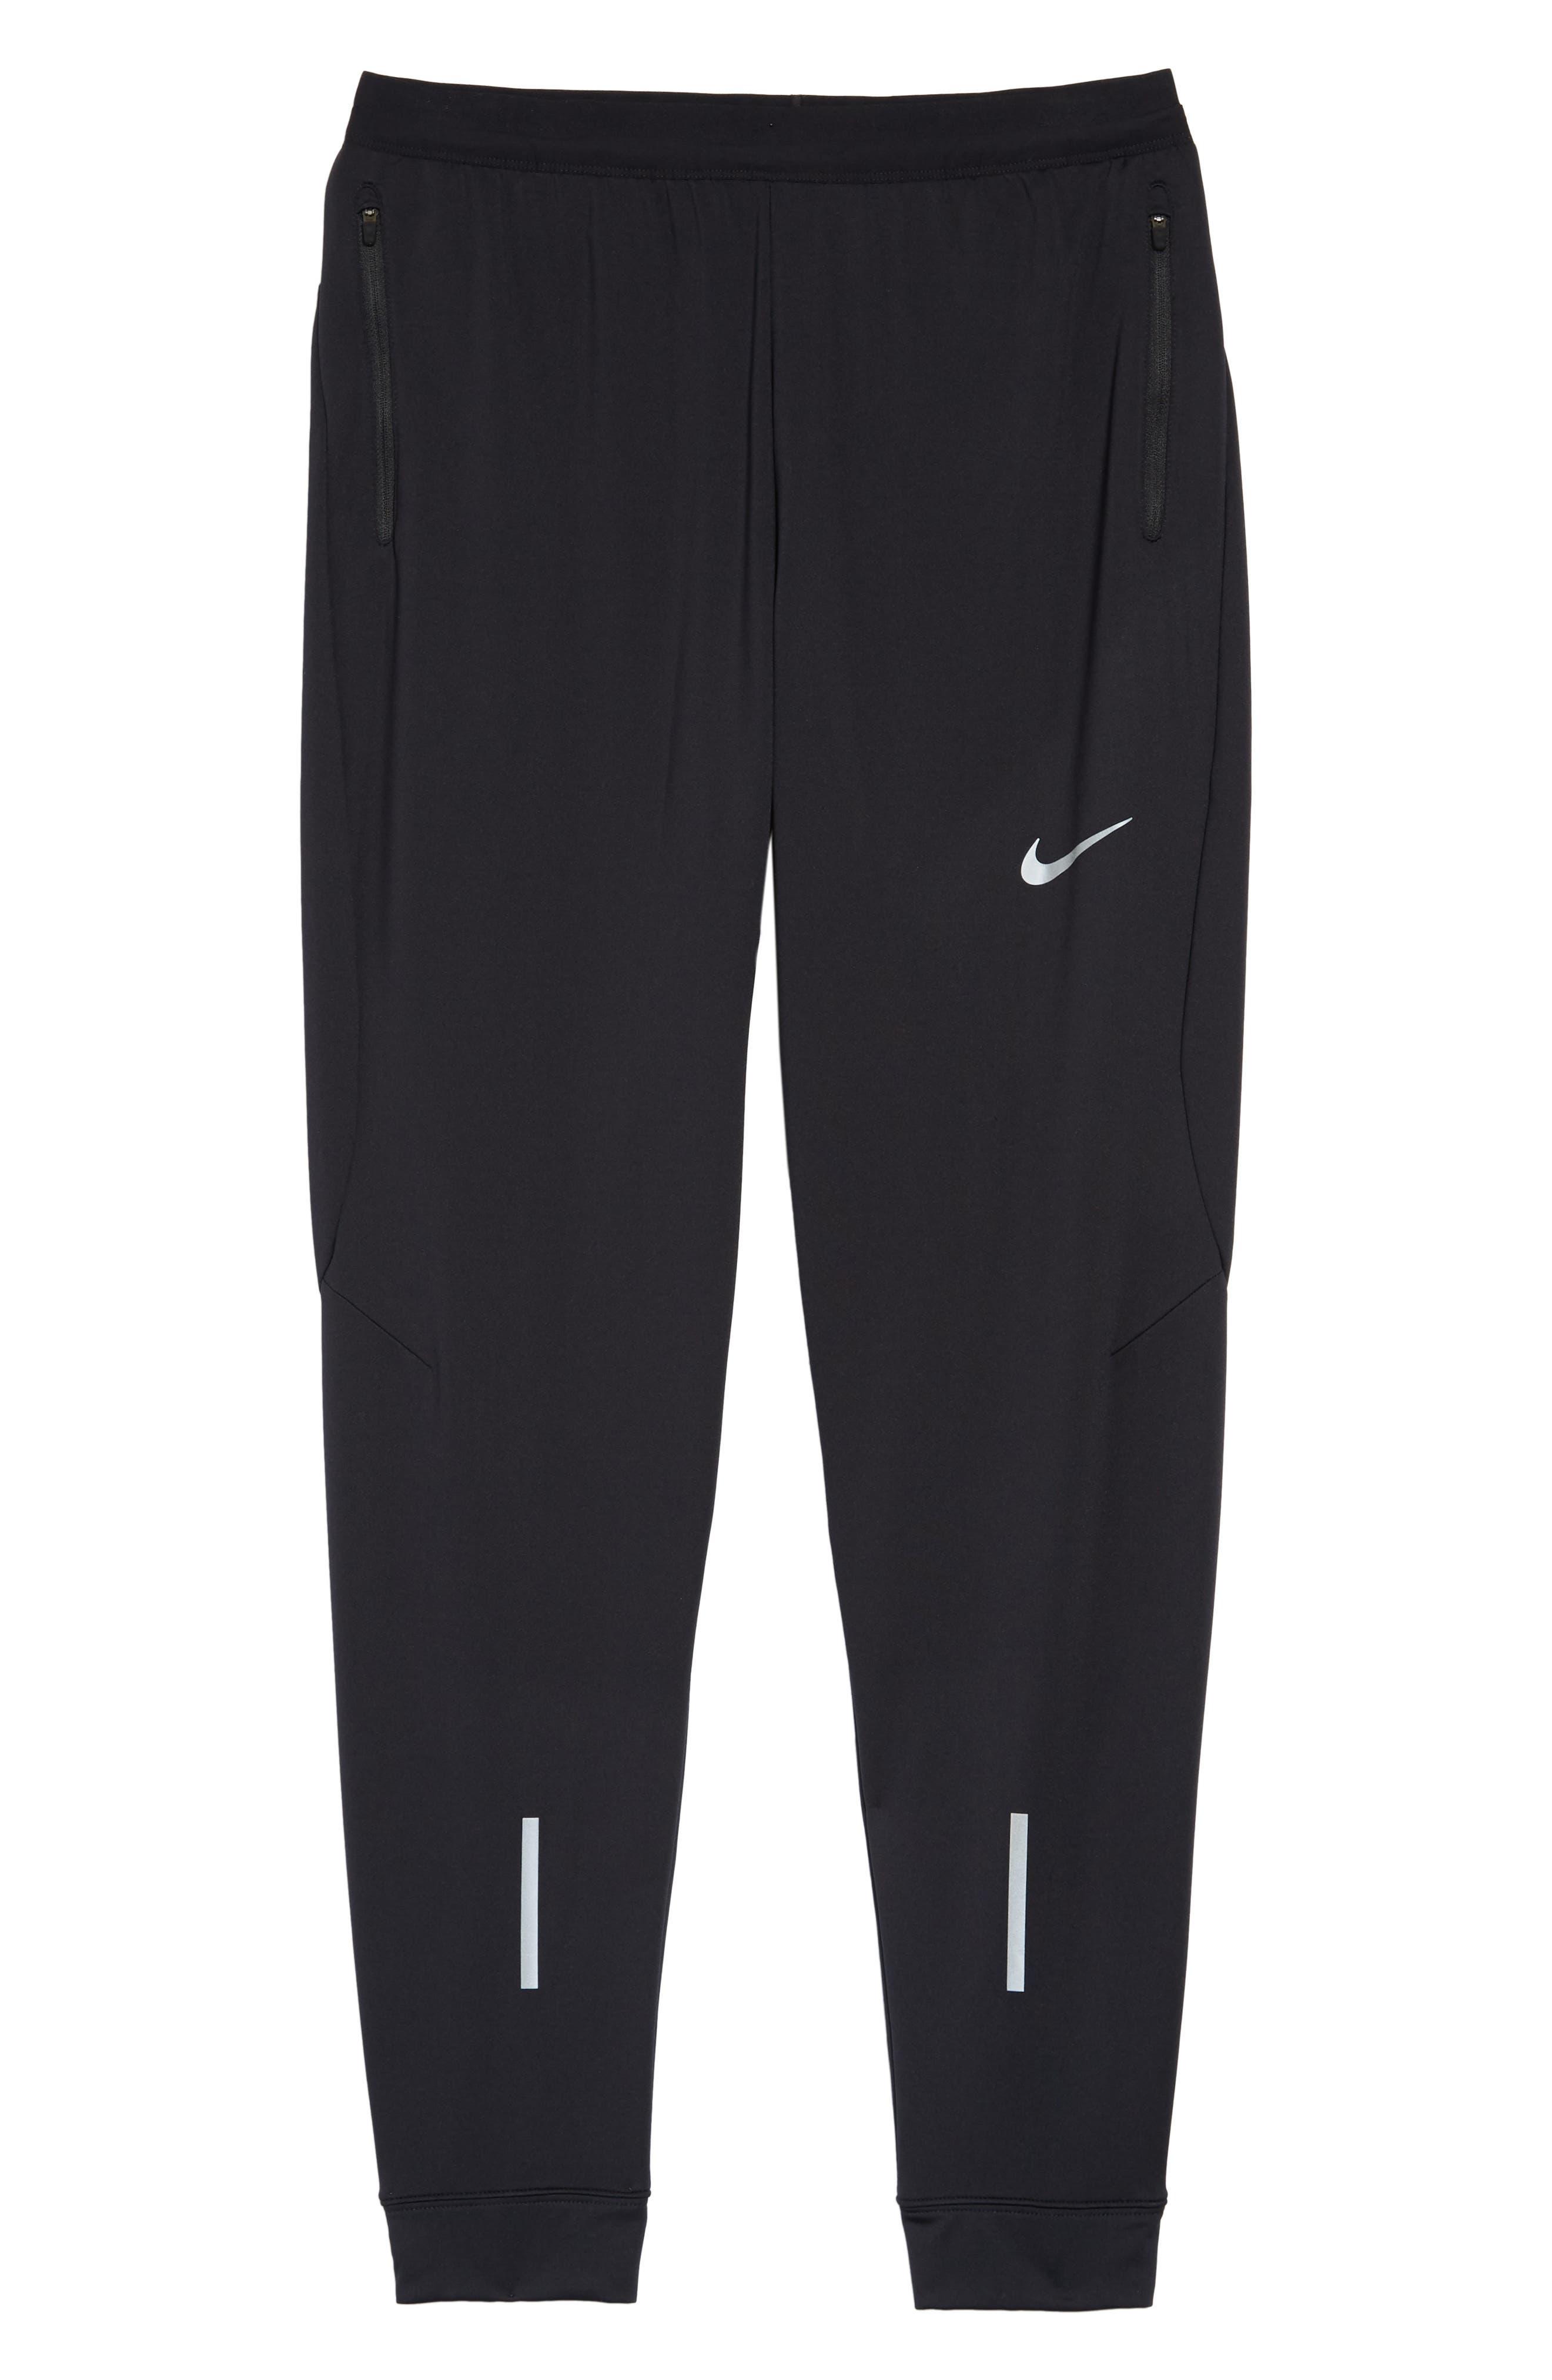 Dry Running Pants,                             Alternate thumbnail 6, color,                             BLACK